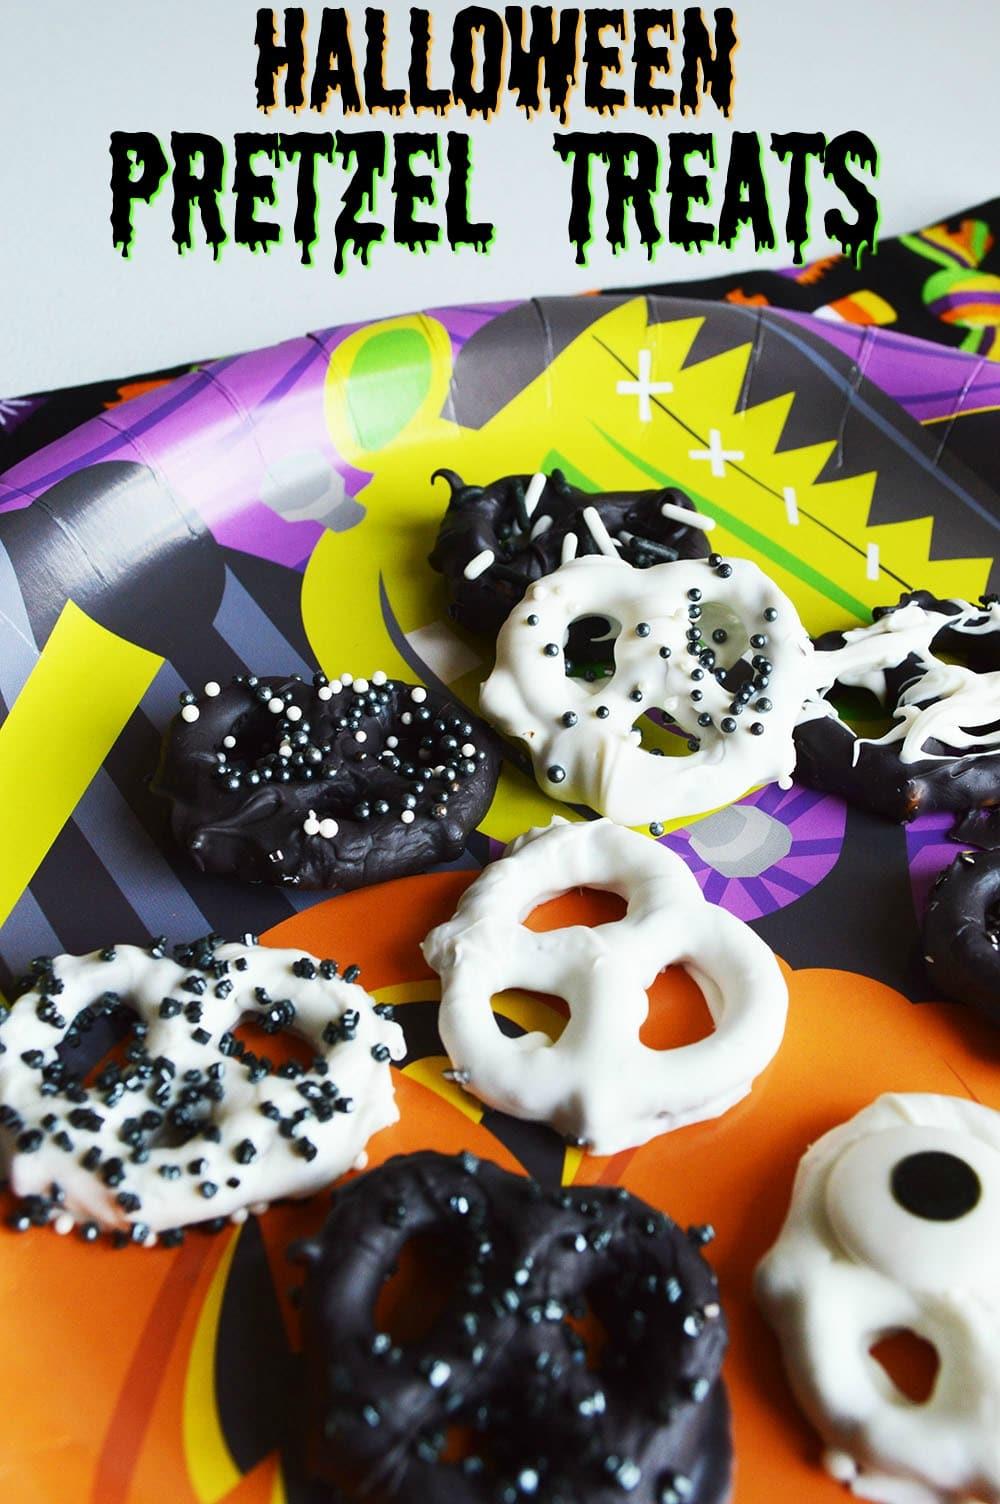 Halloween Pretzel Treats An Easy Chocolate Covered